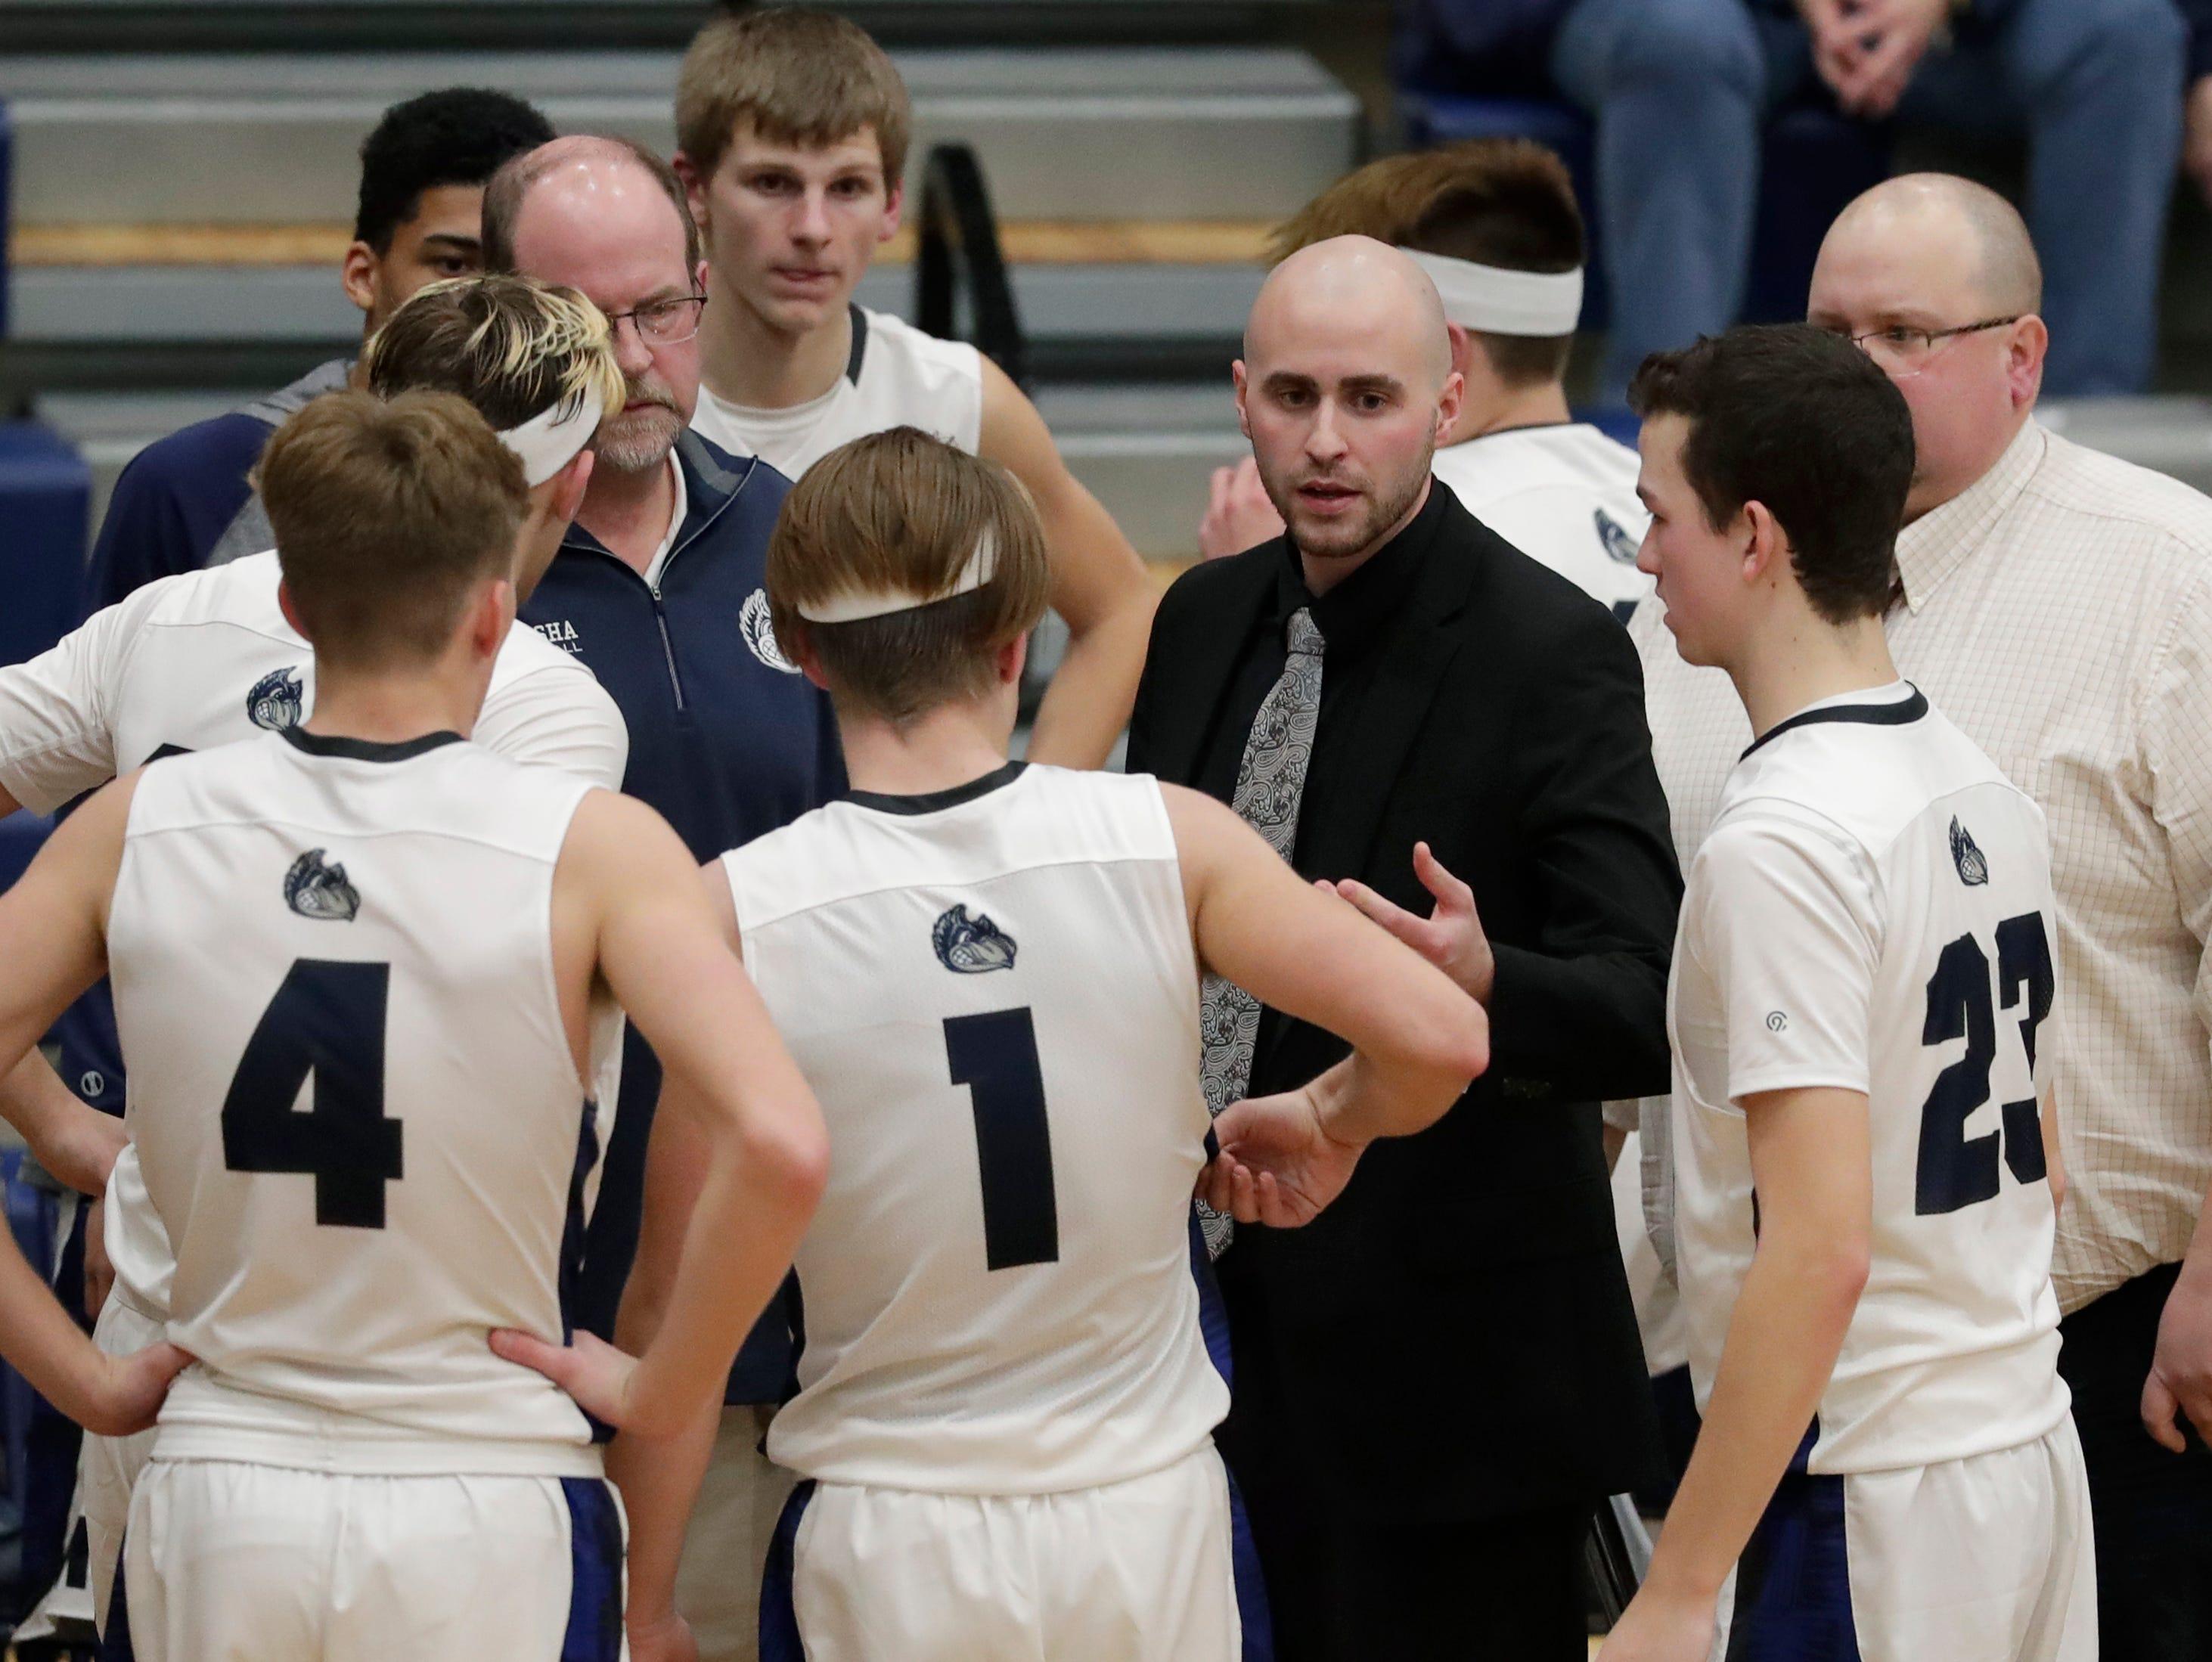 Menasha High School's coach SamKoslowski leads his team against West De Pere High School during their boys basketball game Tuesday, December 11, 2018, in Menasha, Wis. Dan Powers/USA TODAY NETWORK-Wisconsin